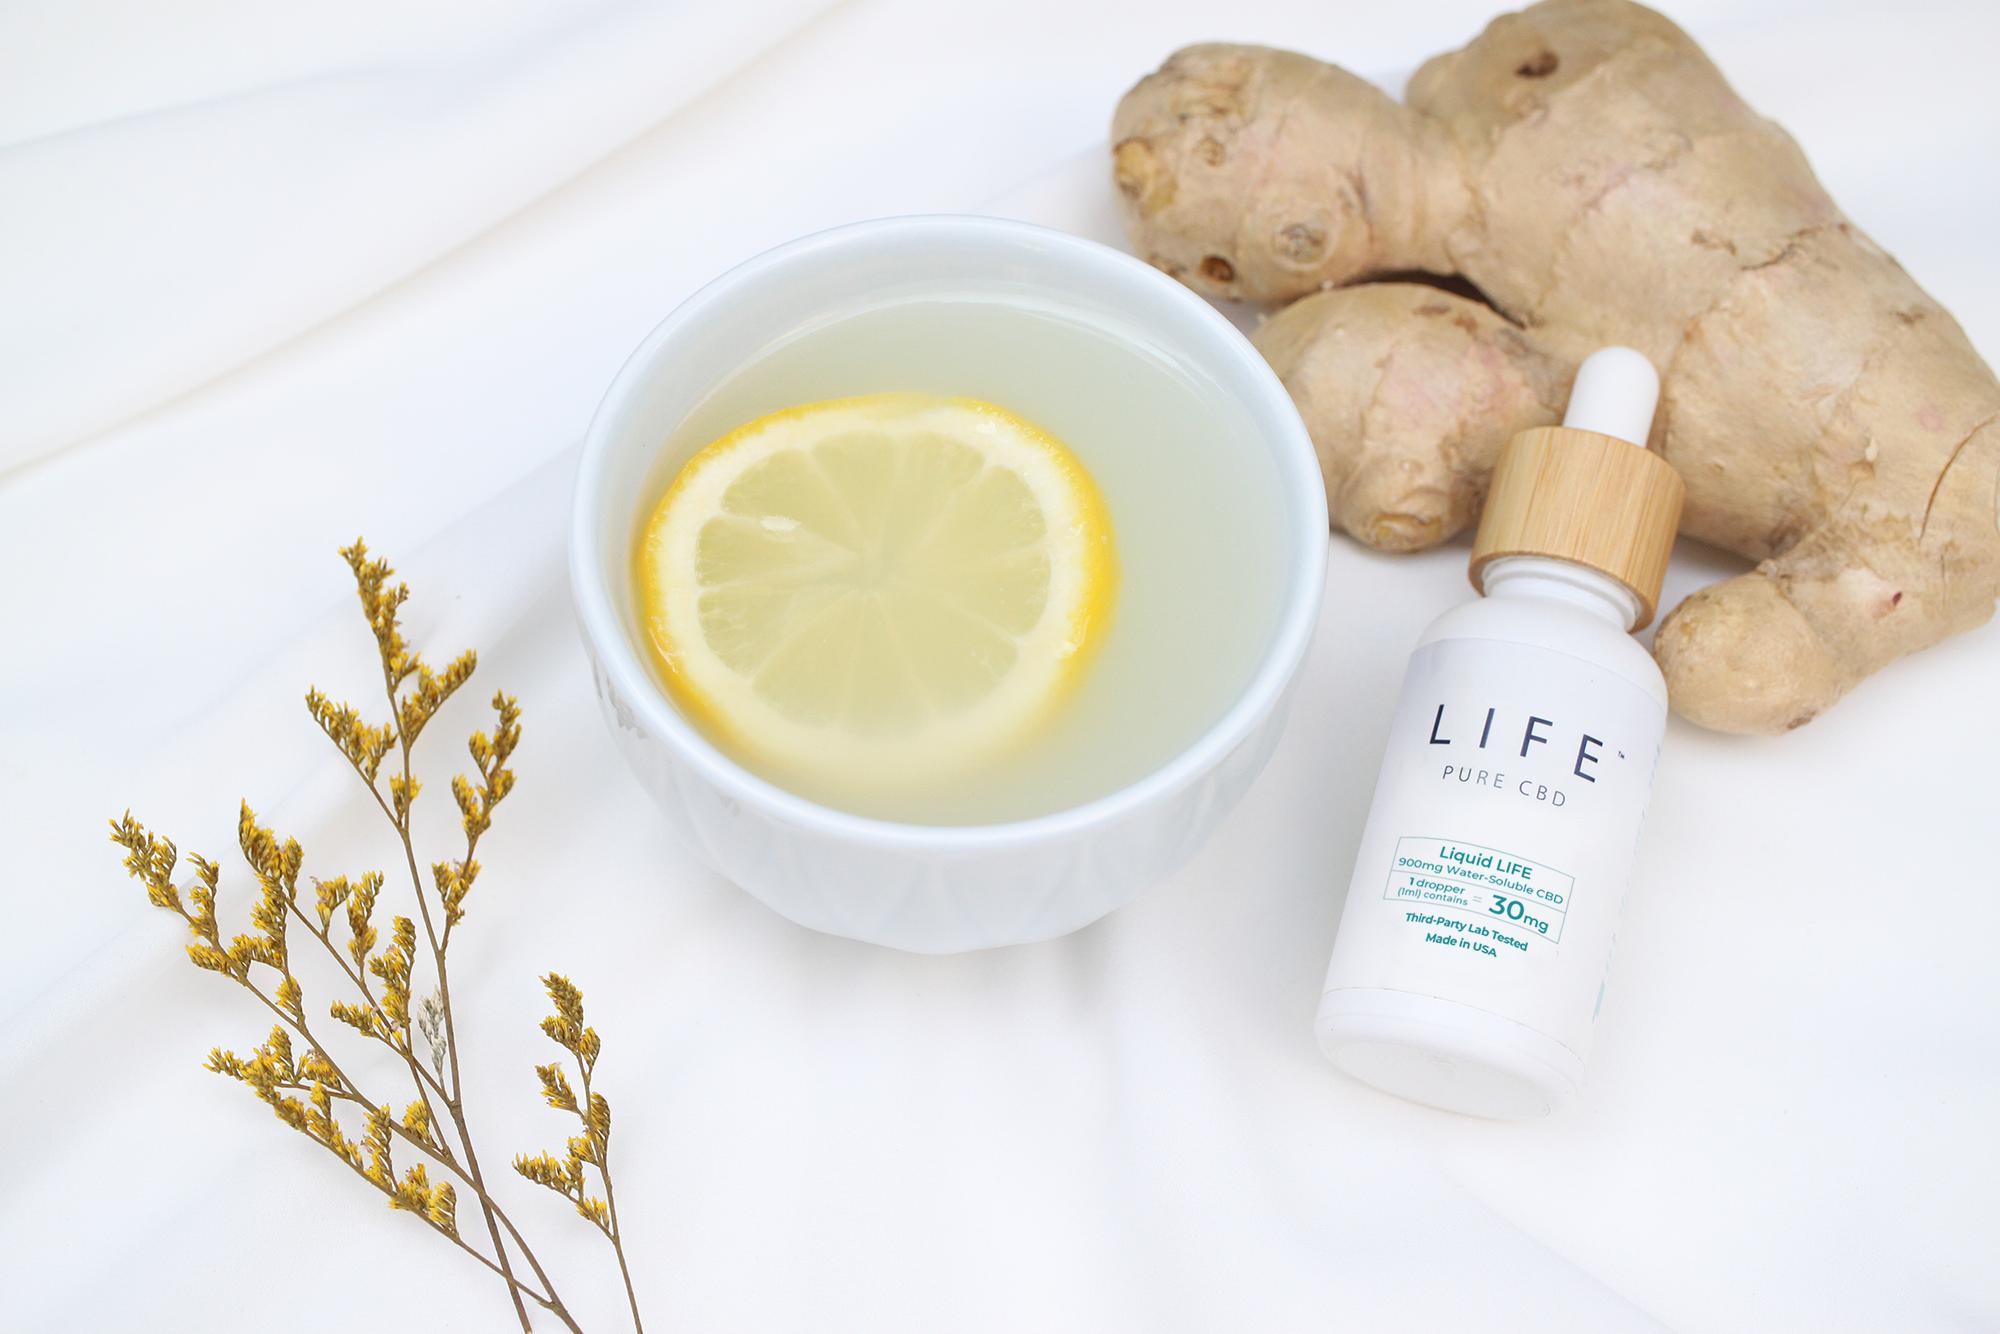 A cup of hot lemon tea with ginger alongside a bottle of Liquid LIFE